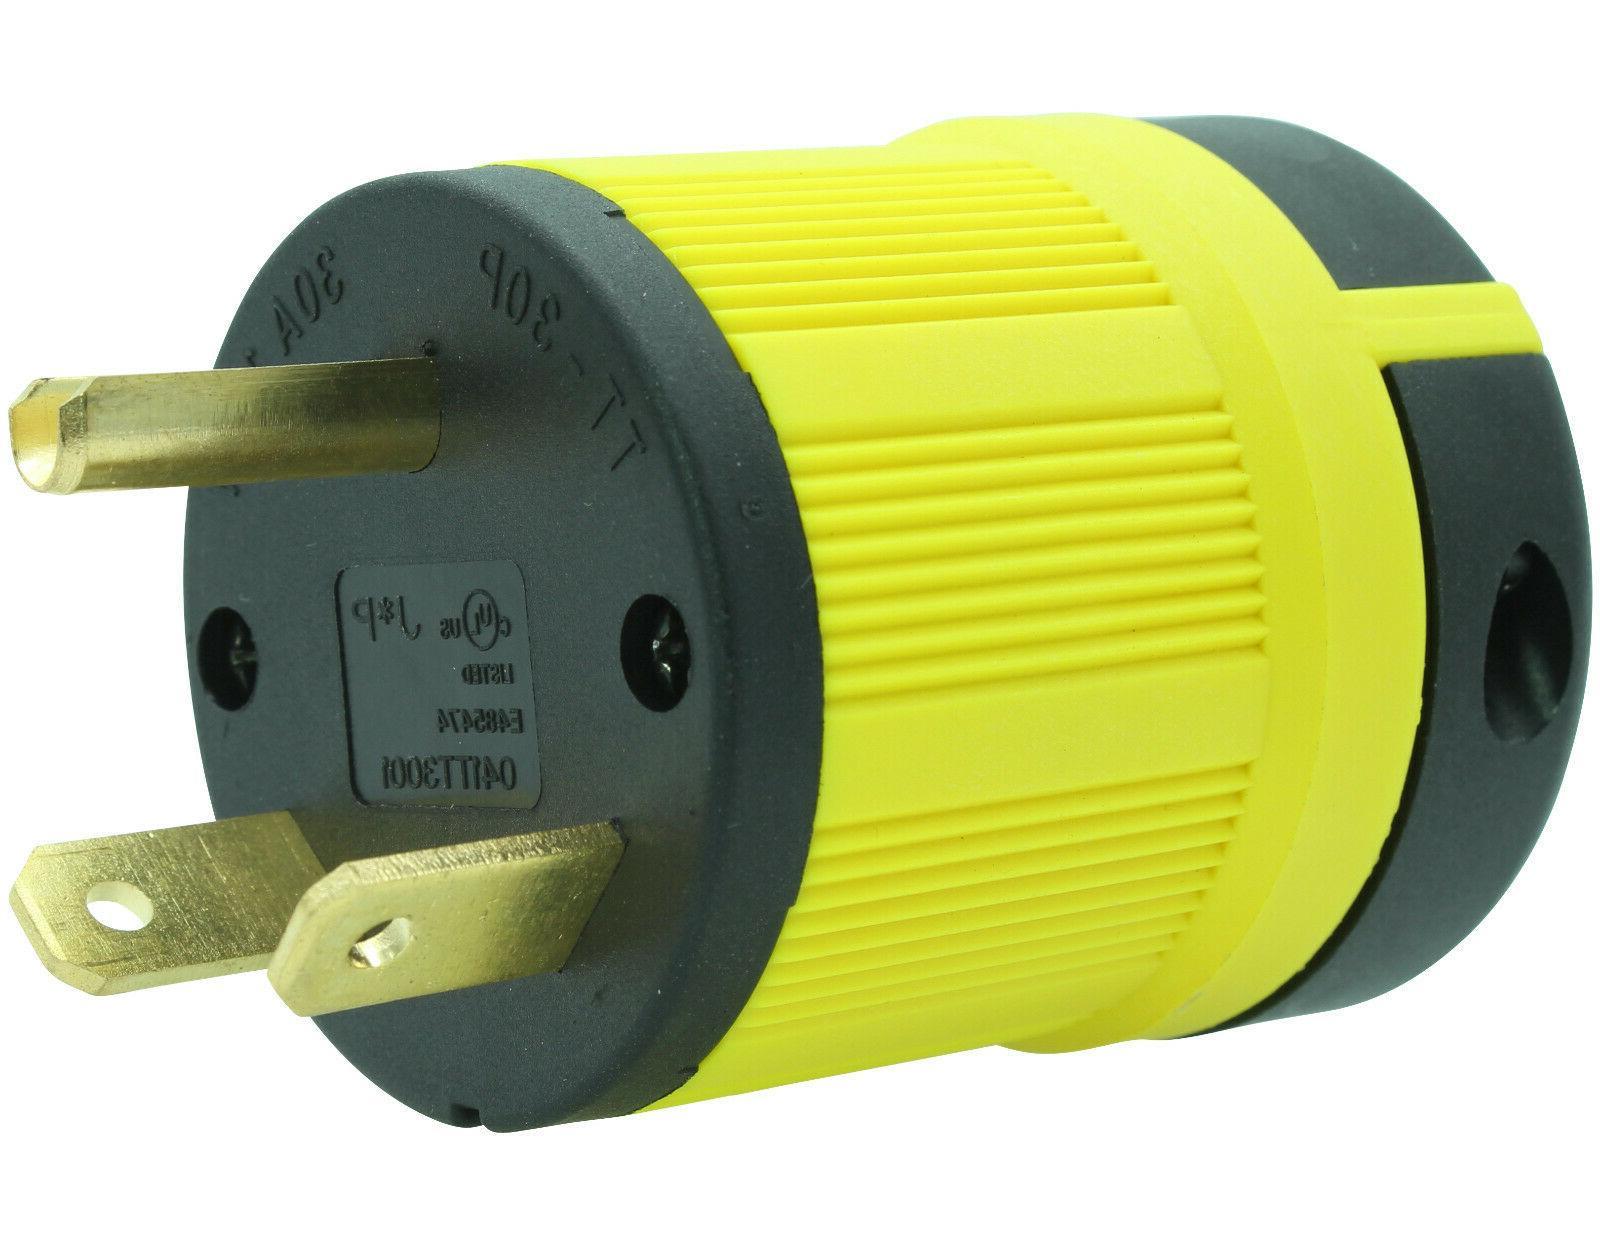 nema tt 30p male plug replacement cord